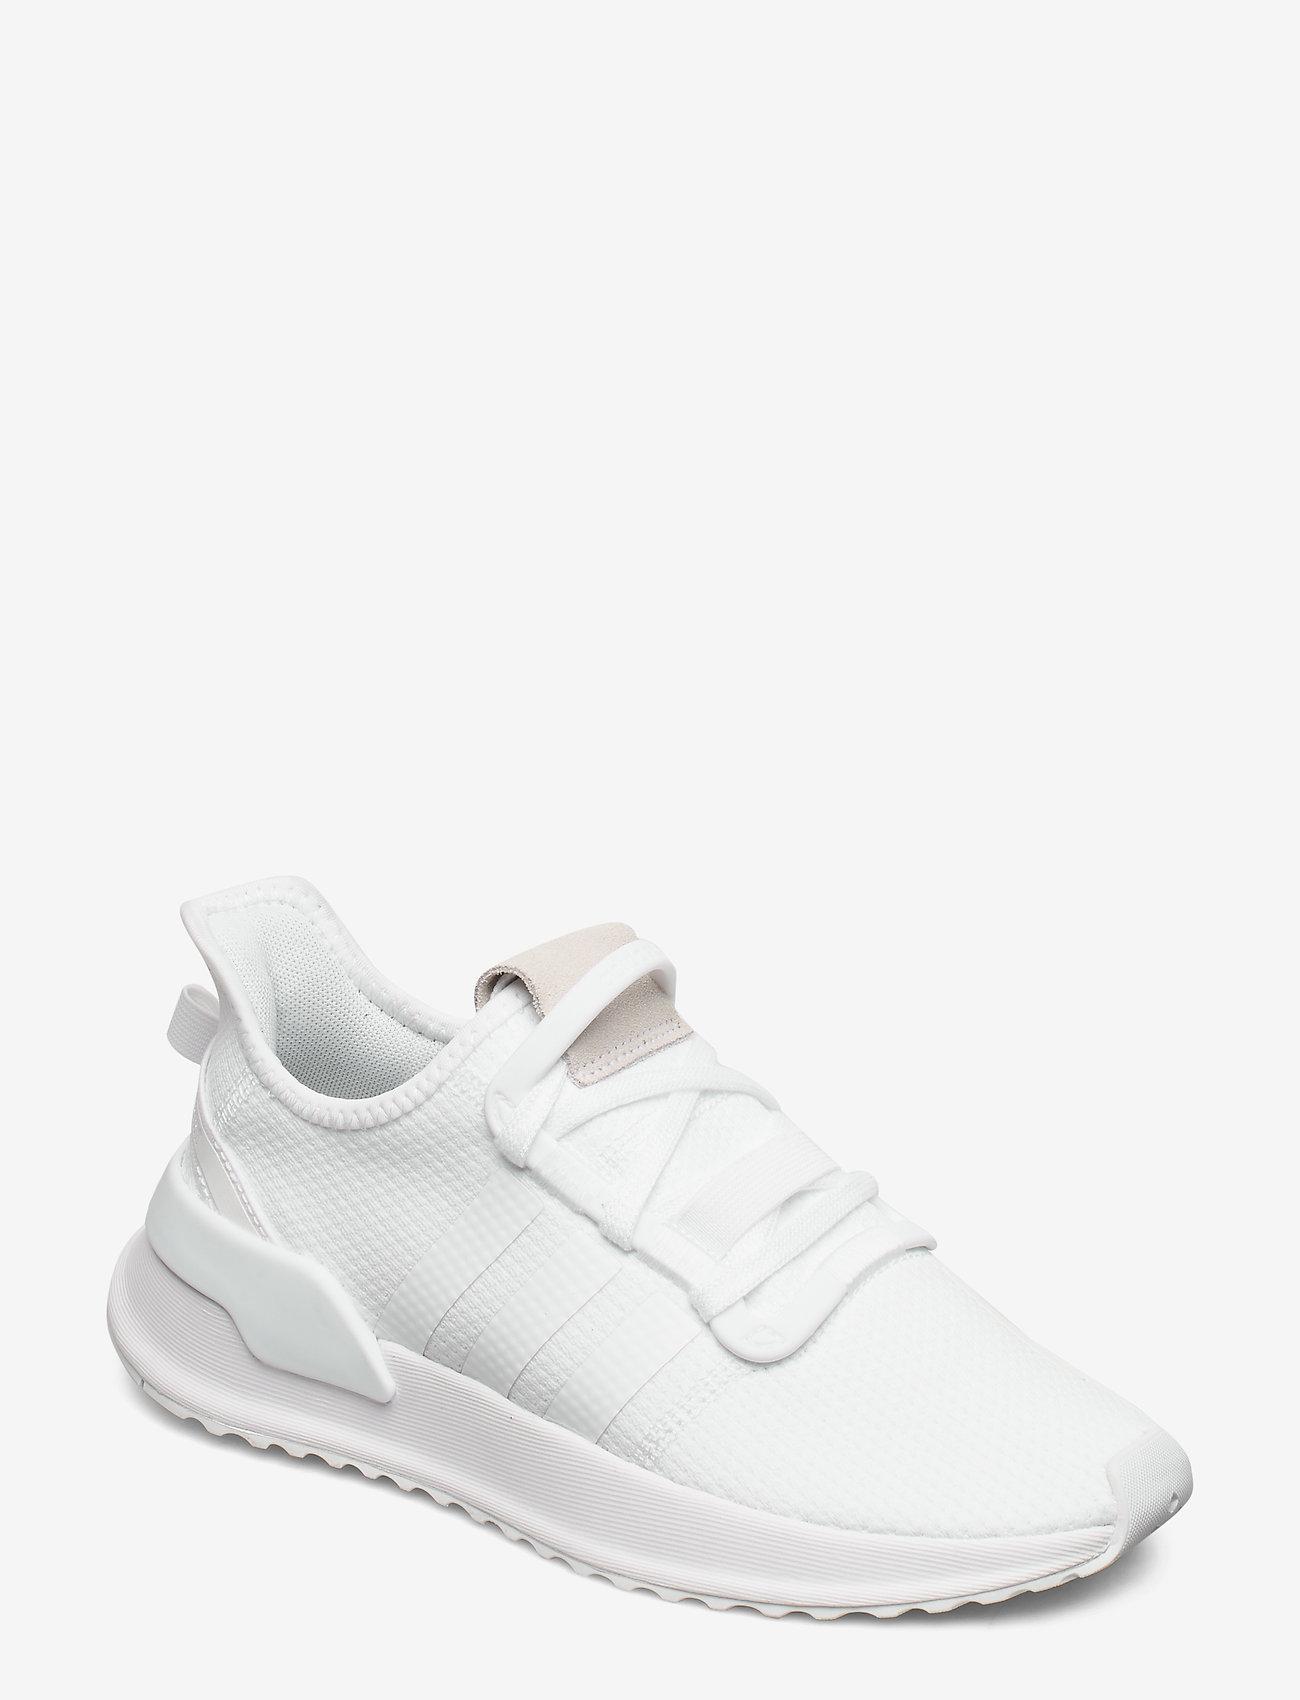 adidas Originals - U_Path Run - niedriger schnitt - ftwwht/ftwwht/ftwwht - 0